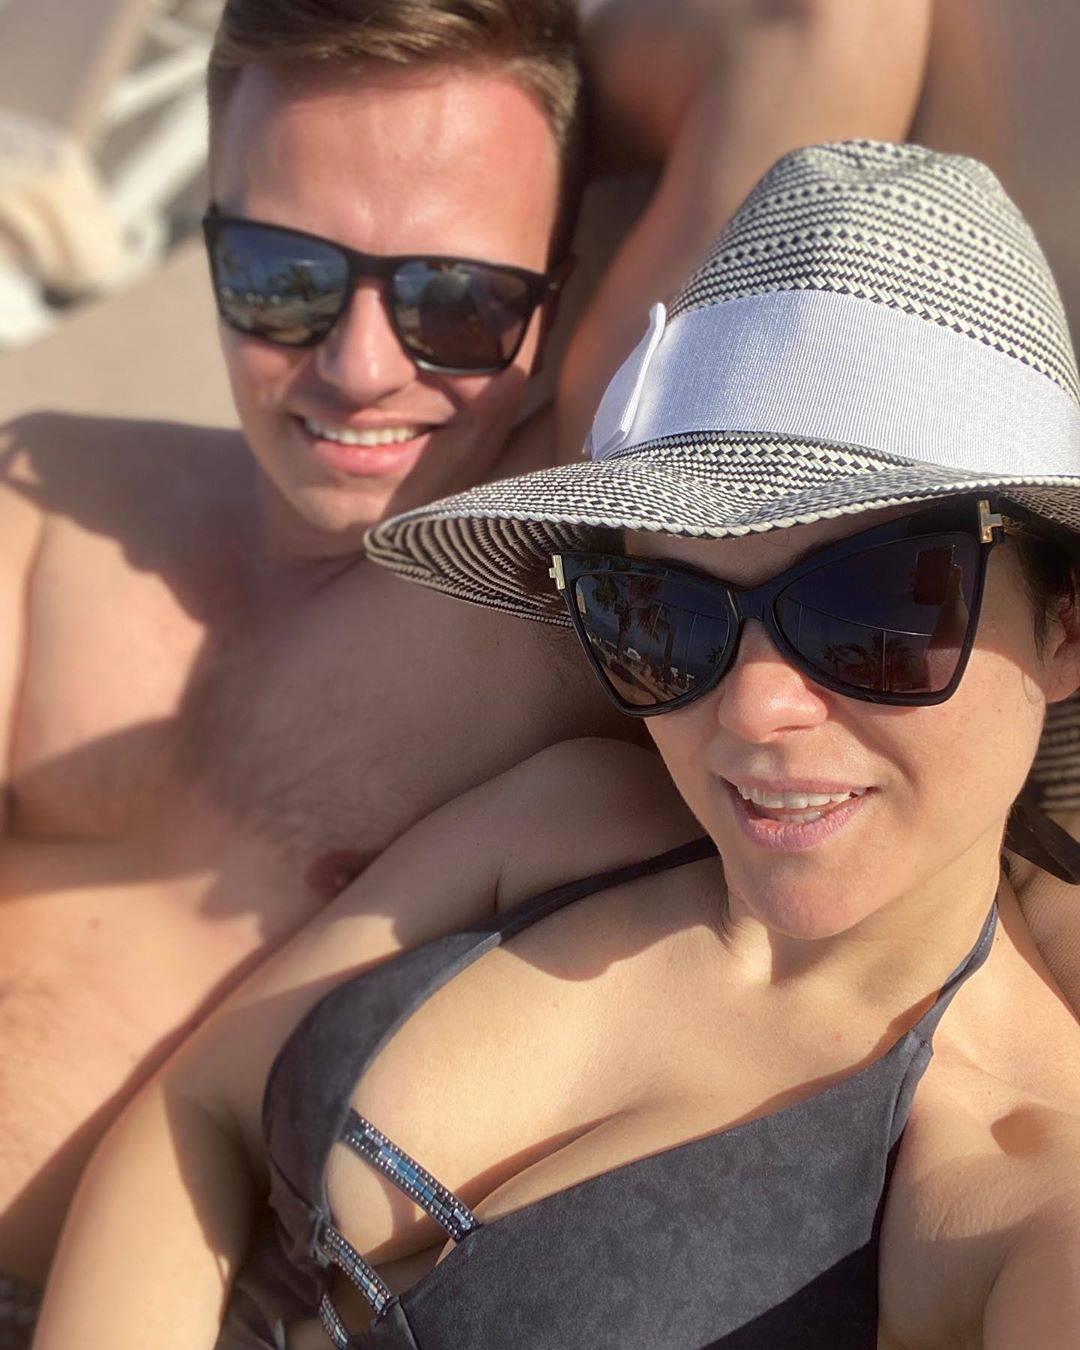 Katarzyna Cichopek i Marcin Hakiel na wakacjach